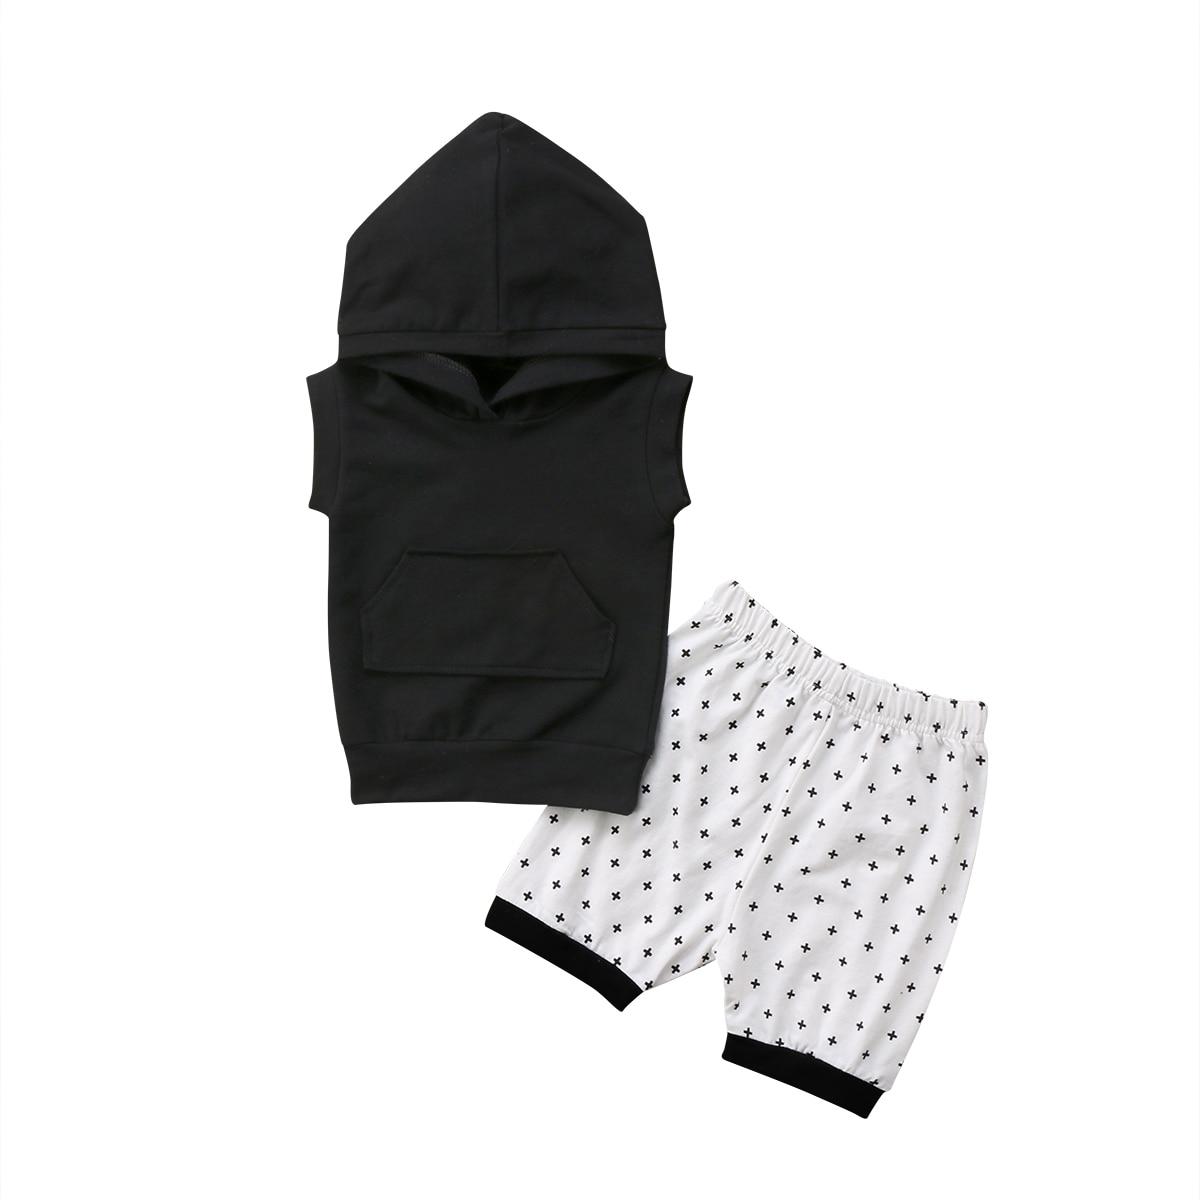 2018 Sport Toddler Kids Boy Outfits Hooded Tanks kangaroo pocket +Geo Cross Shorts Summer Boys Clothes Set